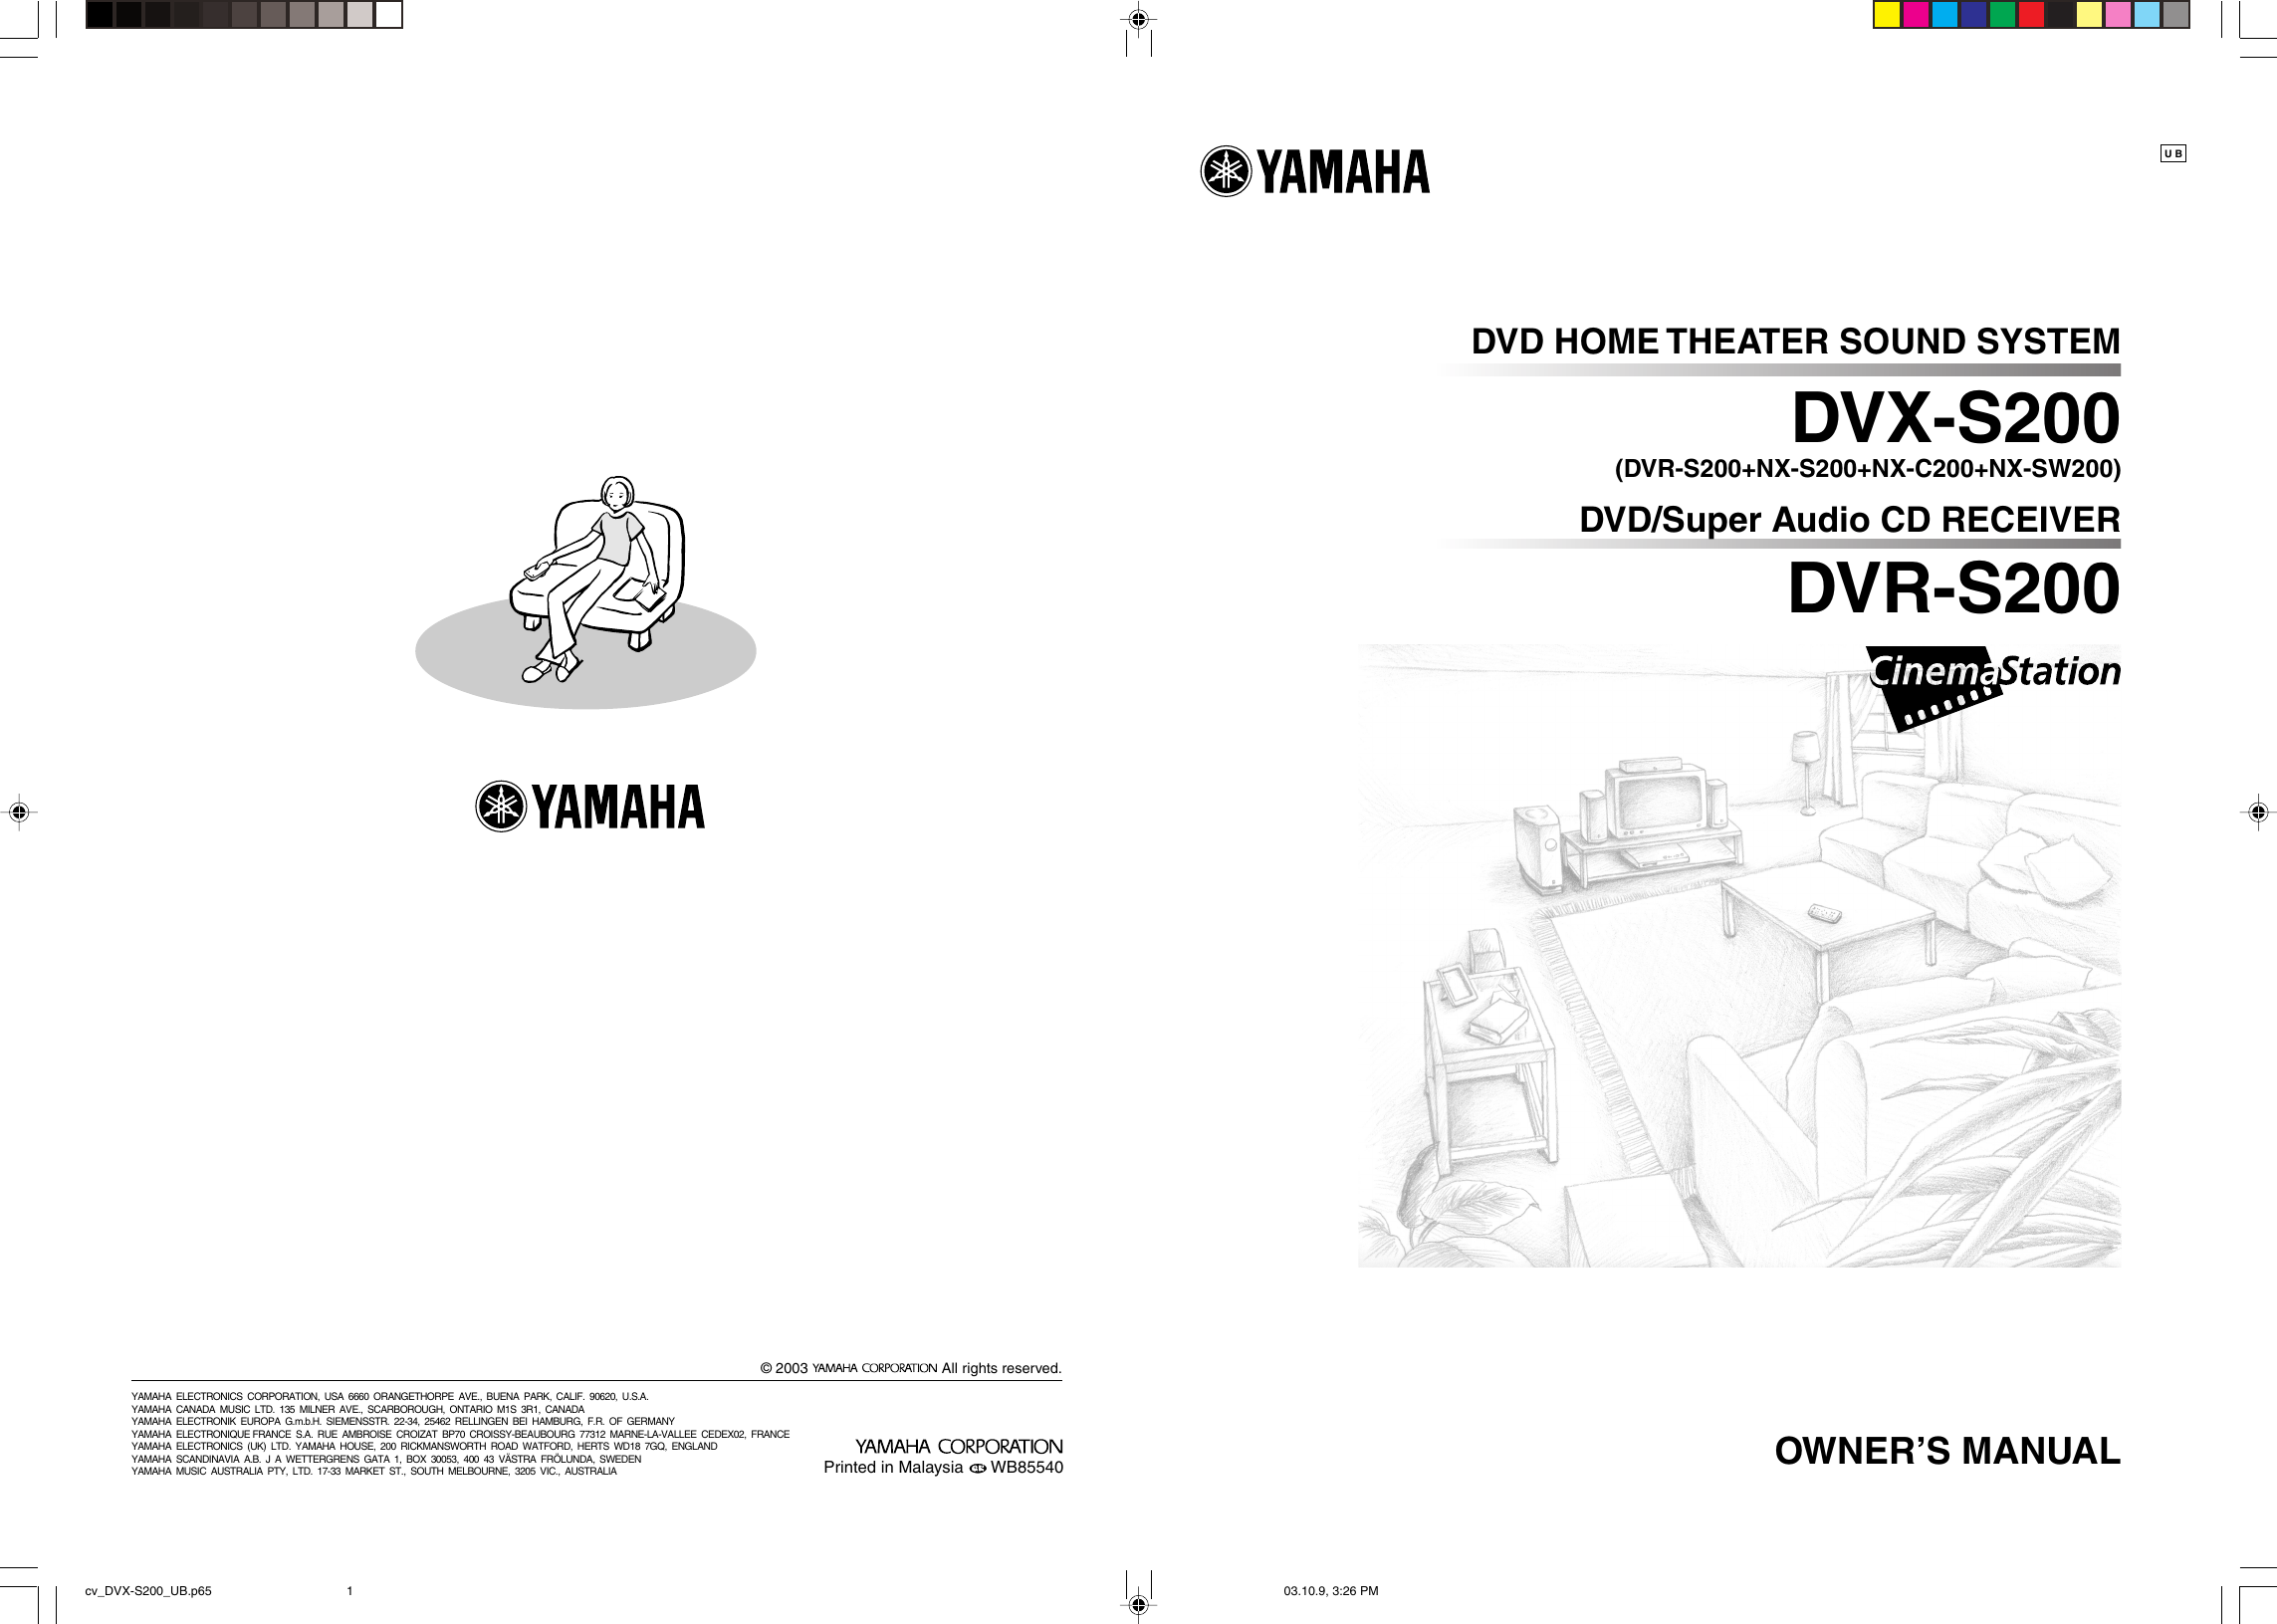 Yamaha Dvr S200 Owners Manual 001dvx S120 En